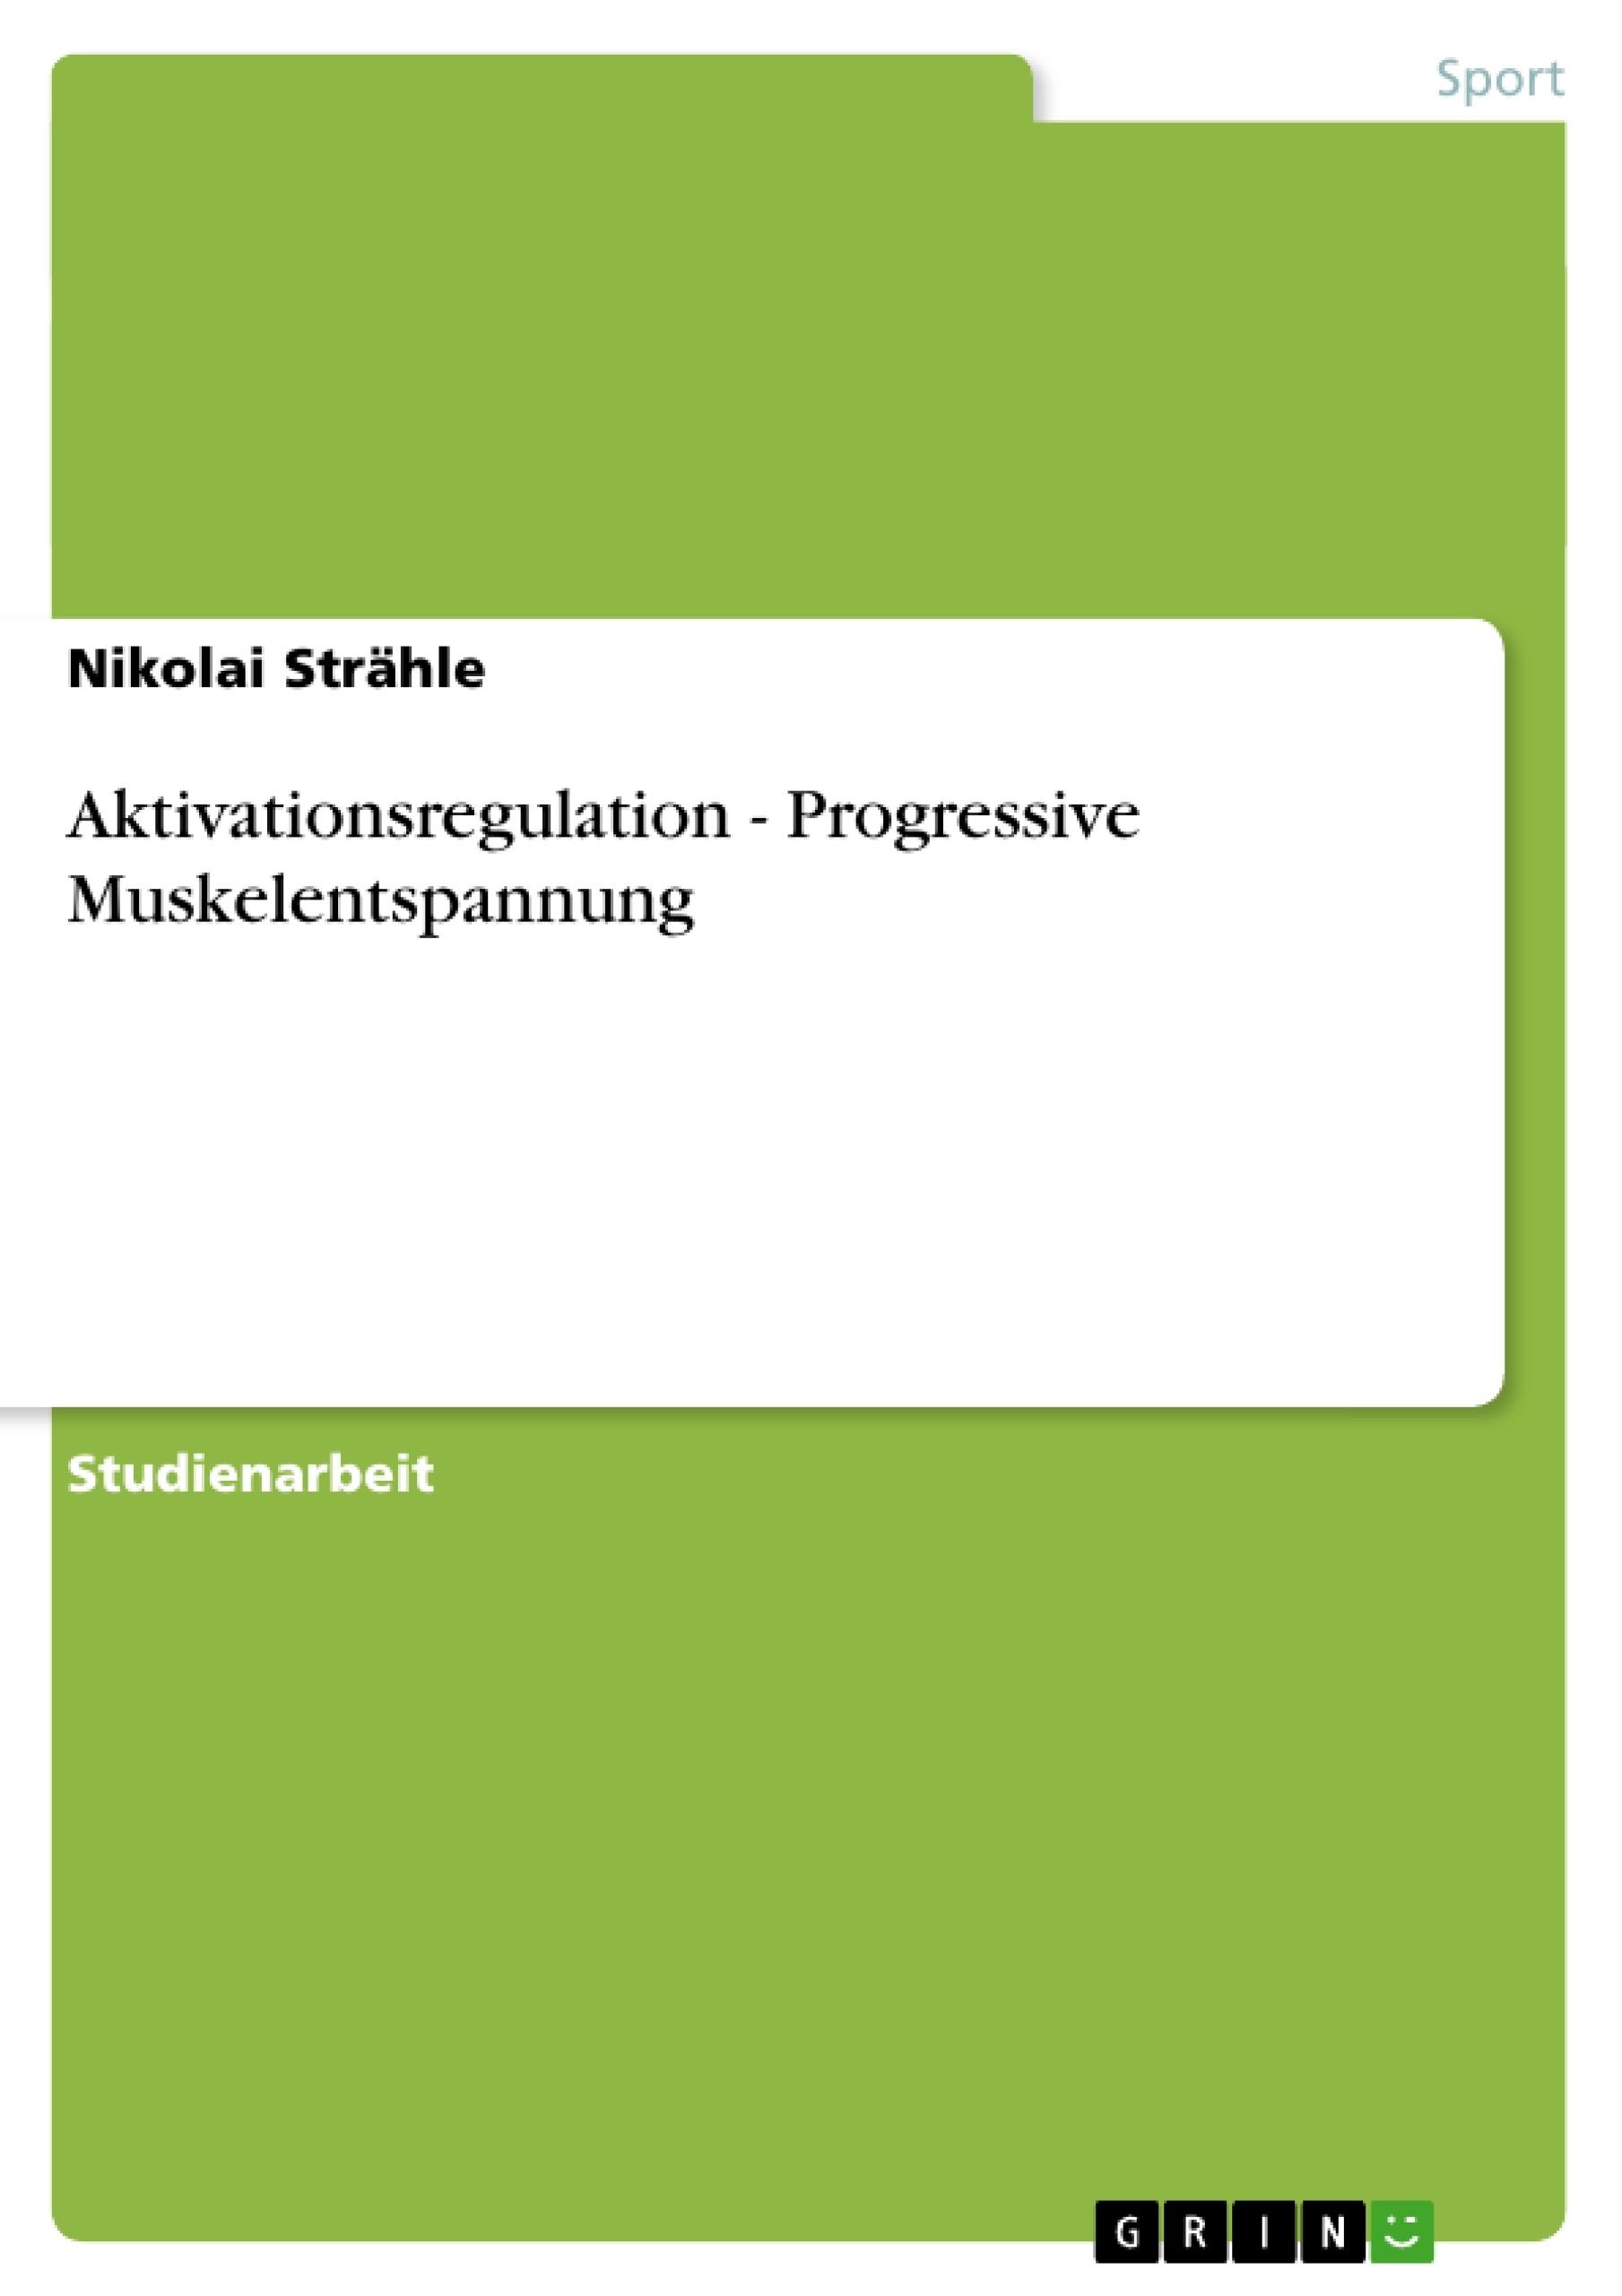 Titel: Aktivationsregulation - Progressive Muskelentspannung